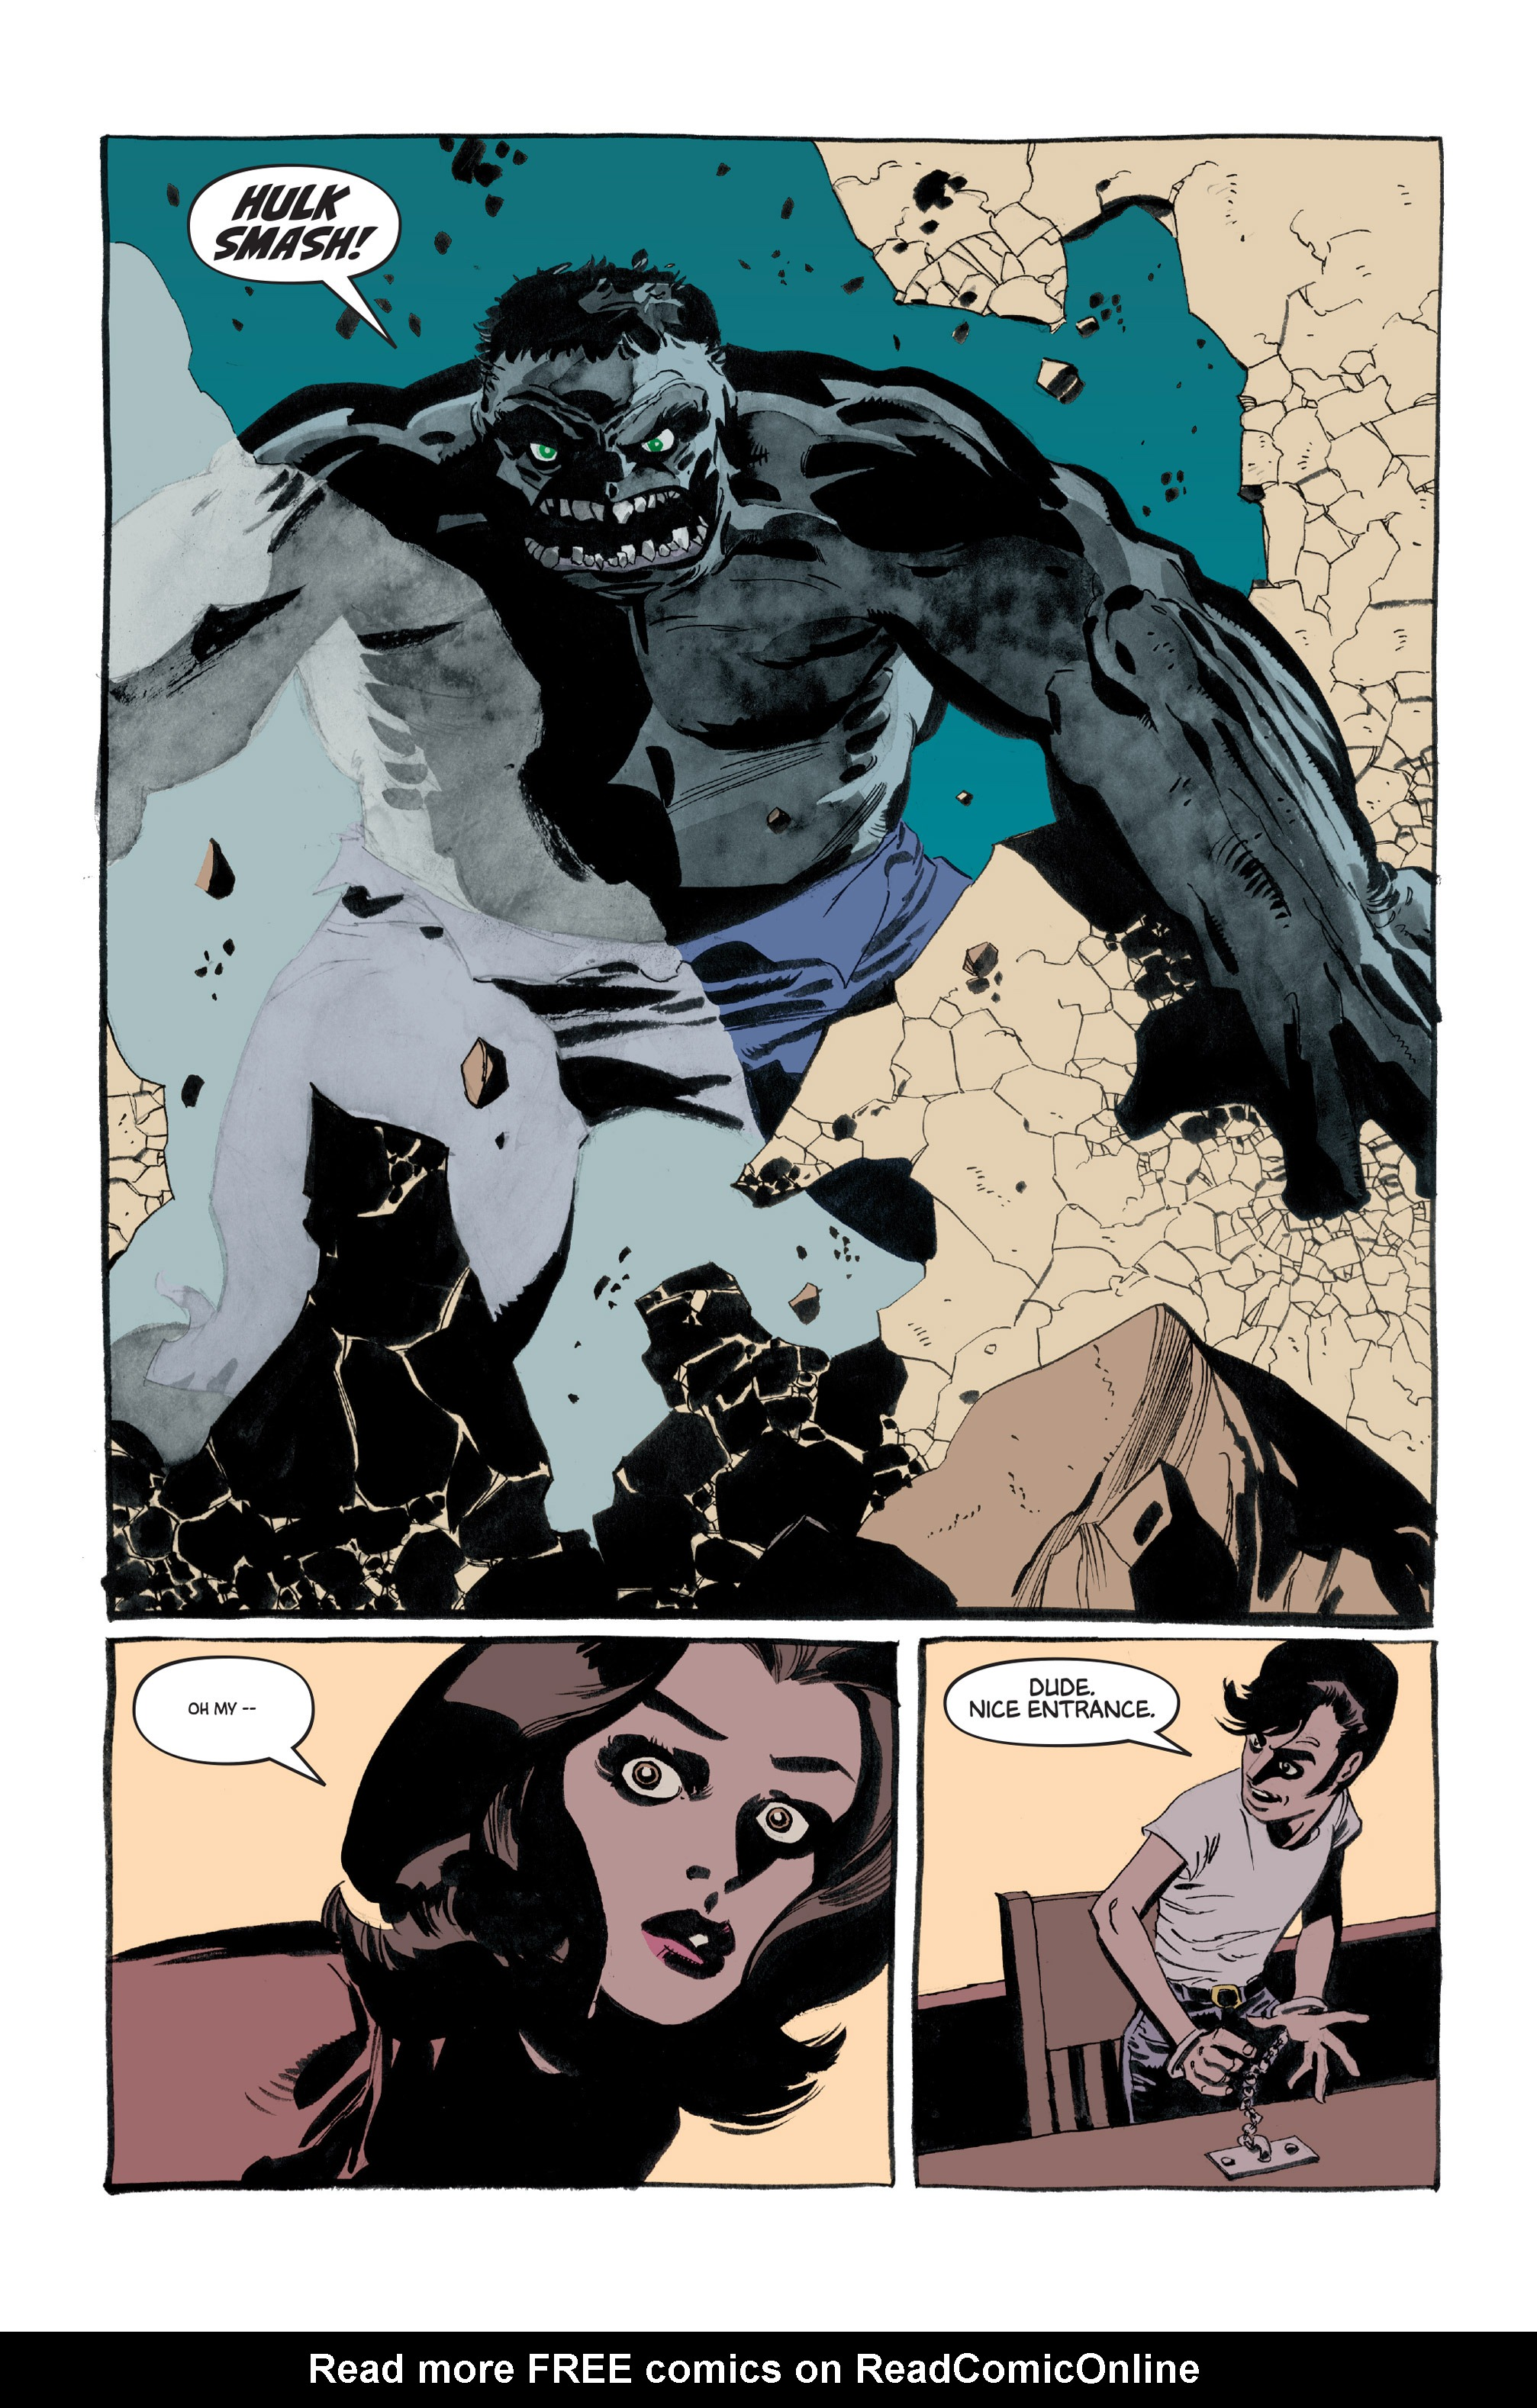 Read online Hulk: Gray comic -  Issue #3 - 18